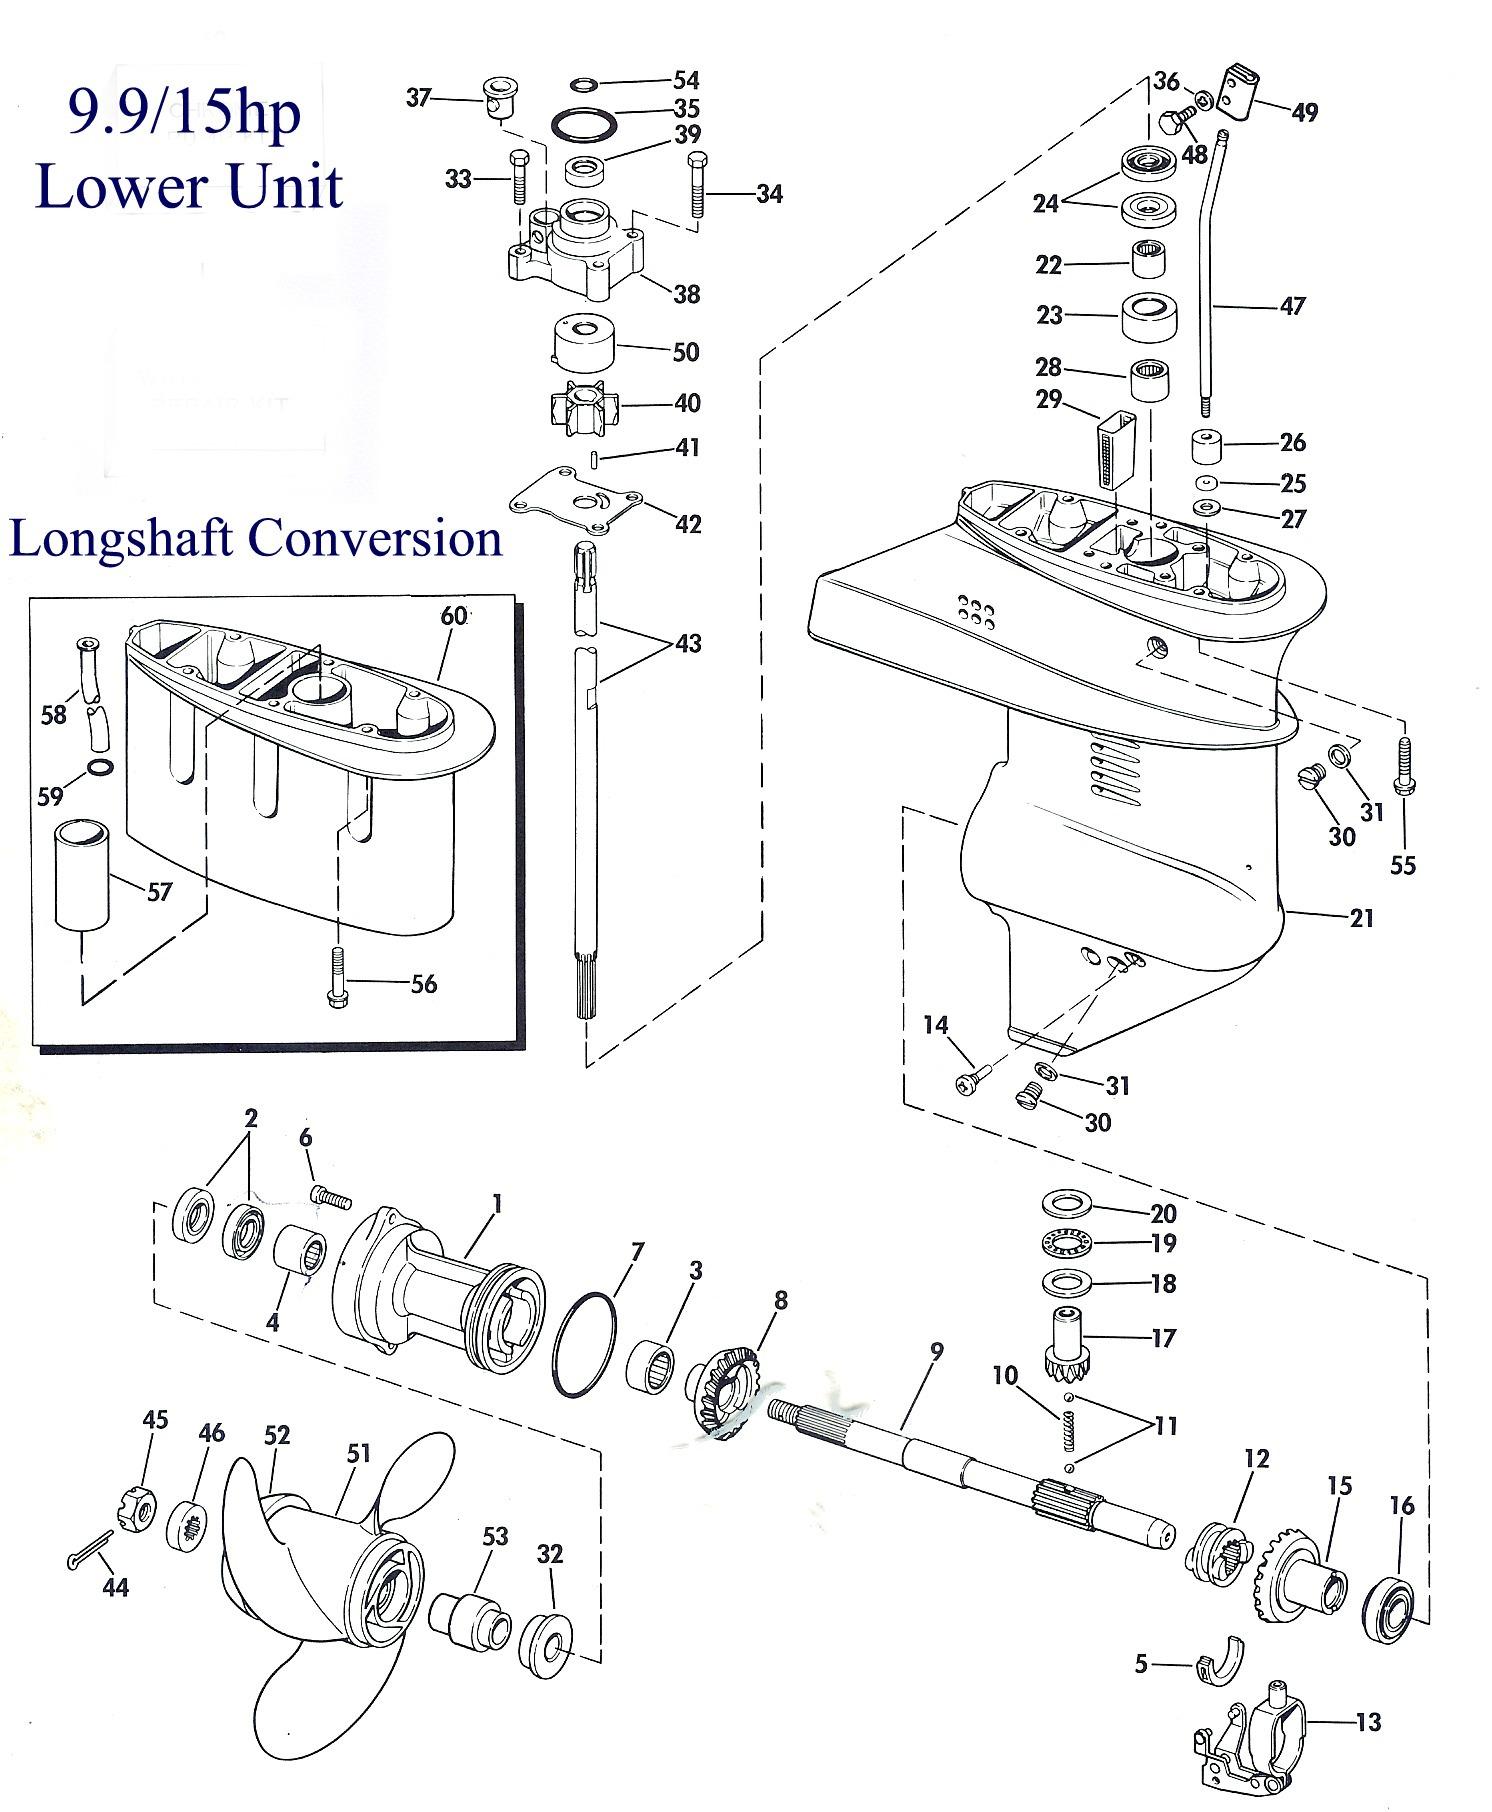 outboard motor lower unit diagram les paul 3 pickup wiring 90 hp 4 stroke mercury get free